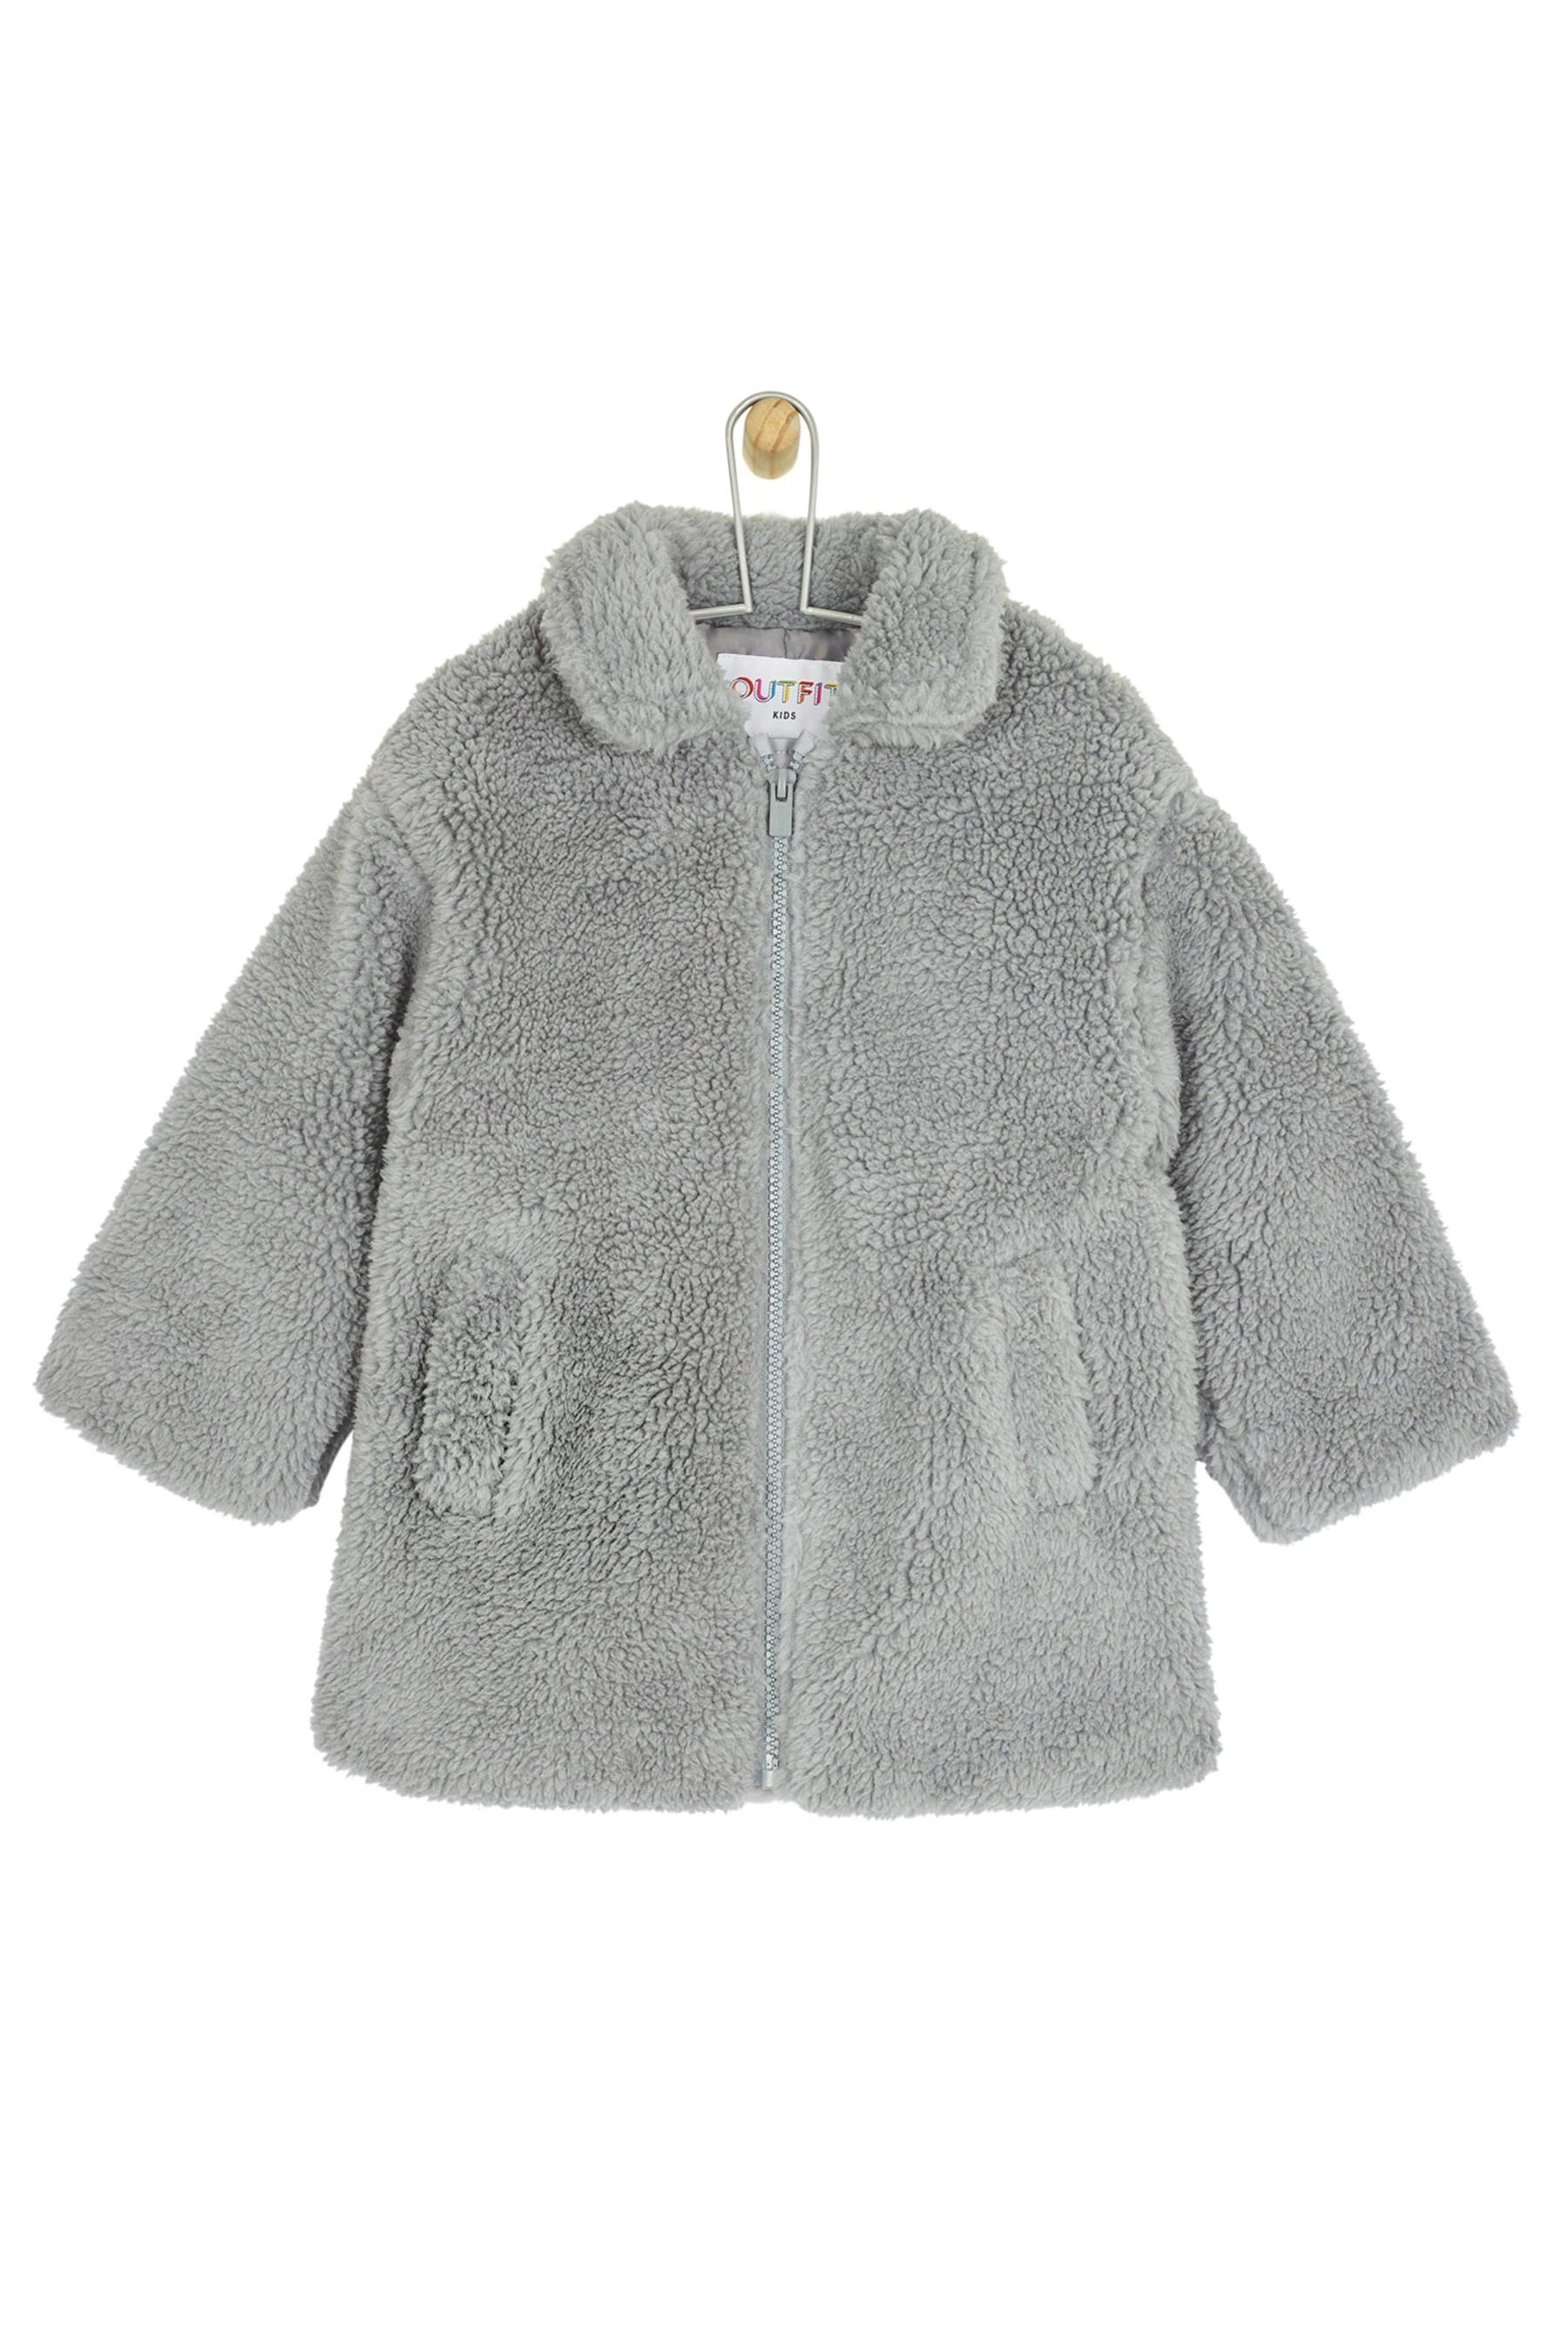 9a37c9227 Girls Outfit Kids Toddler Girls Teddy Fleece Coat - Grey in 2019 ...